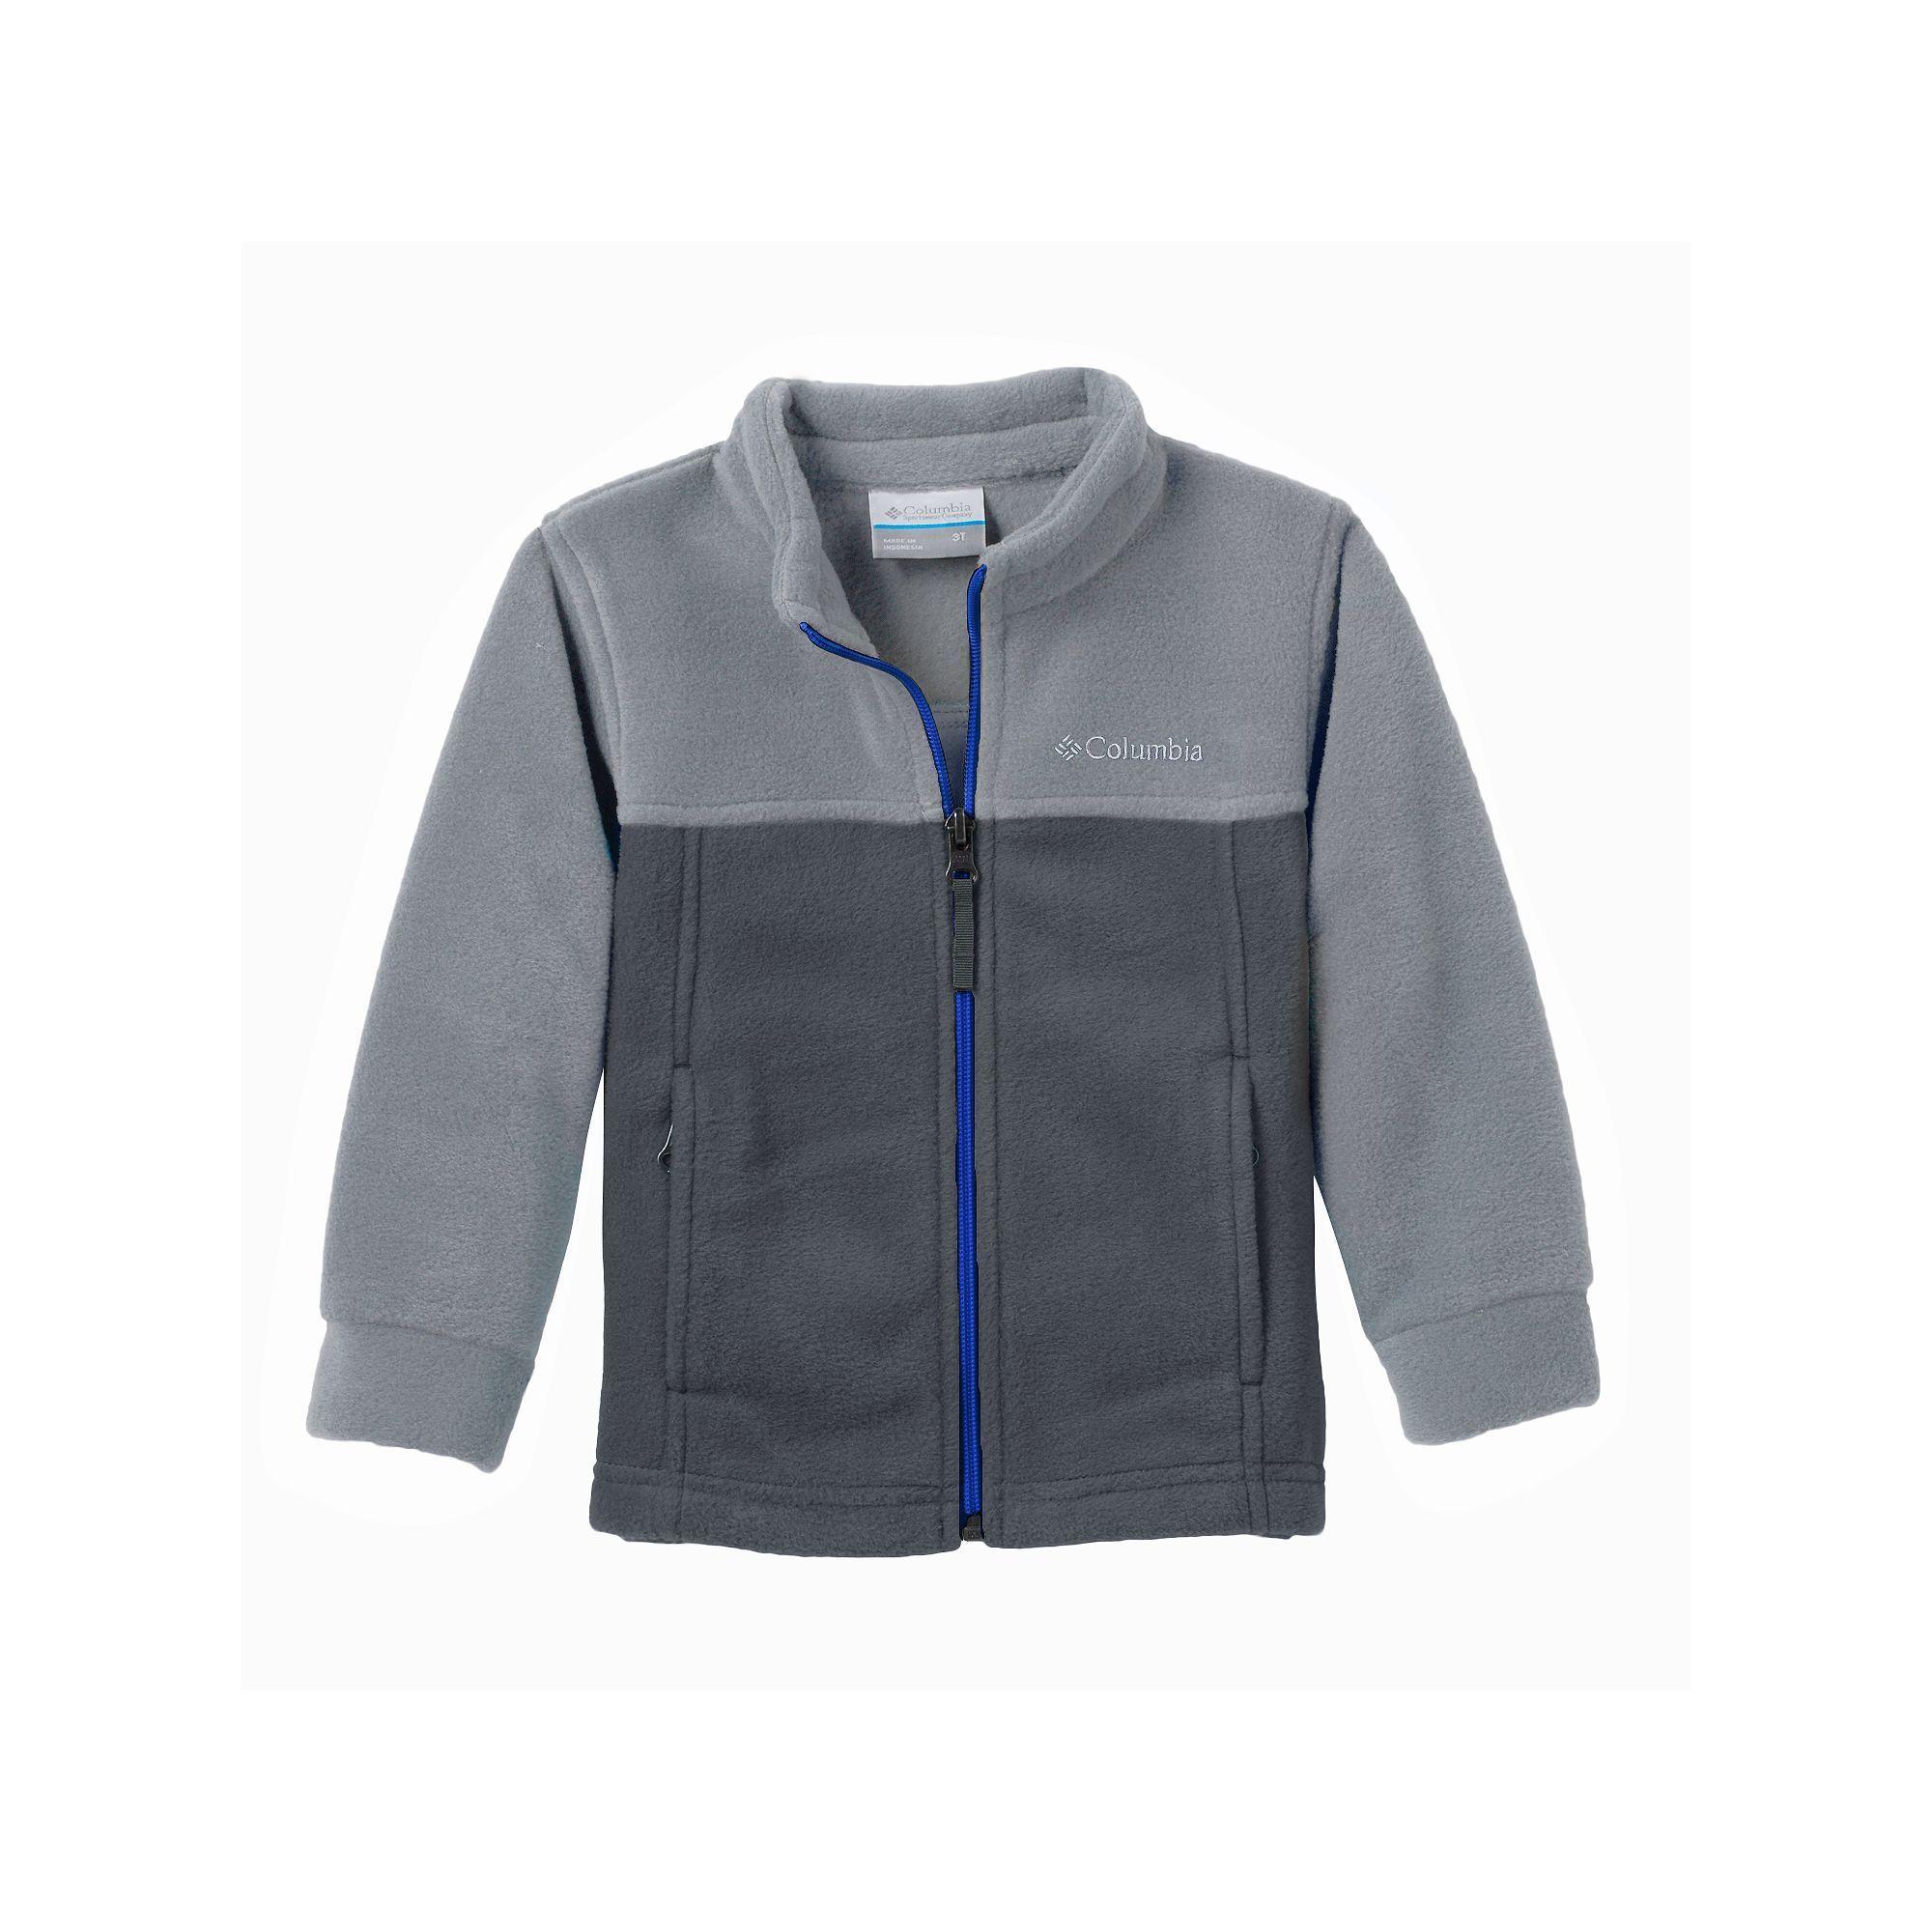 a0d60c01a74 Toddler Boy Columbia Lightweight Fleece Jacket | Products | Columbia ...